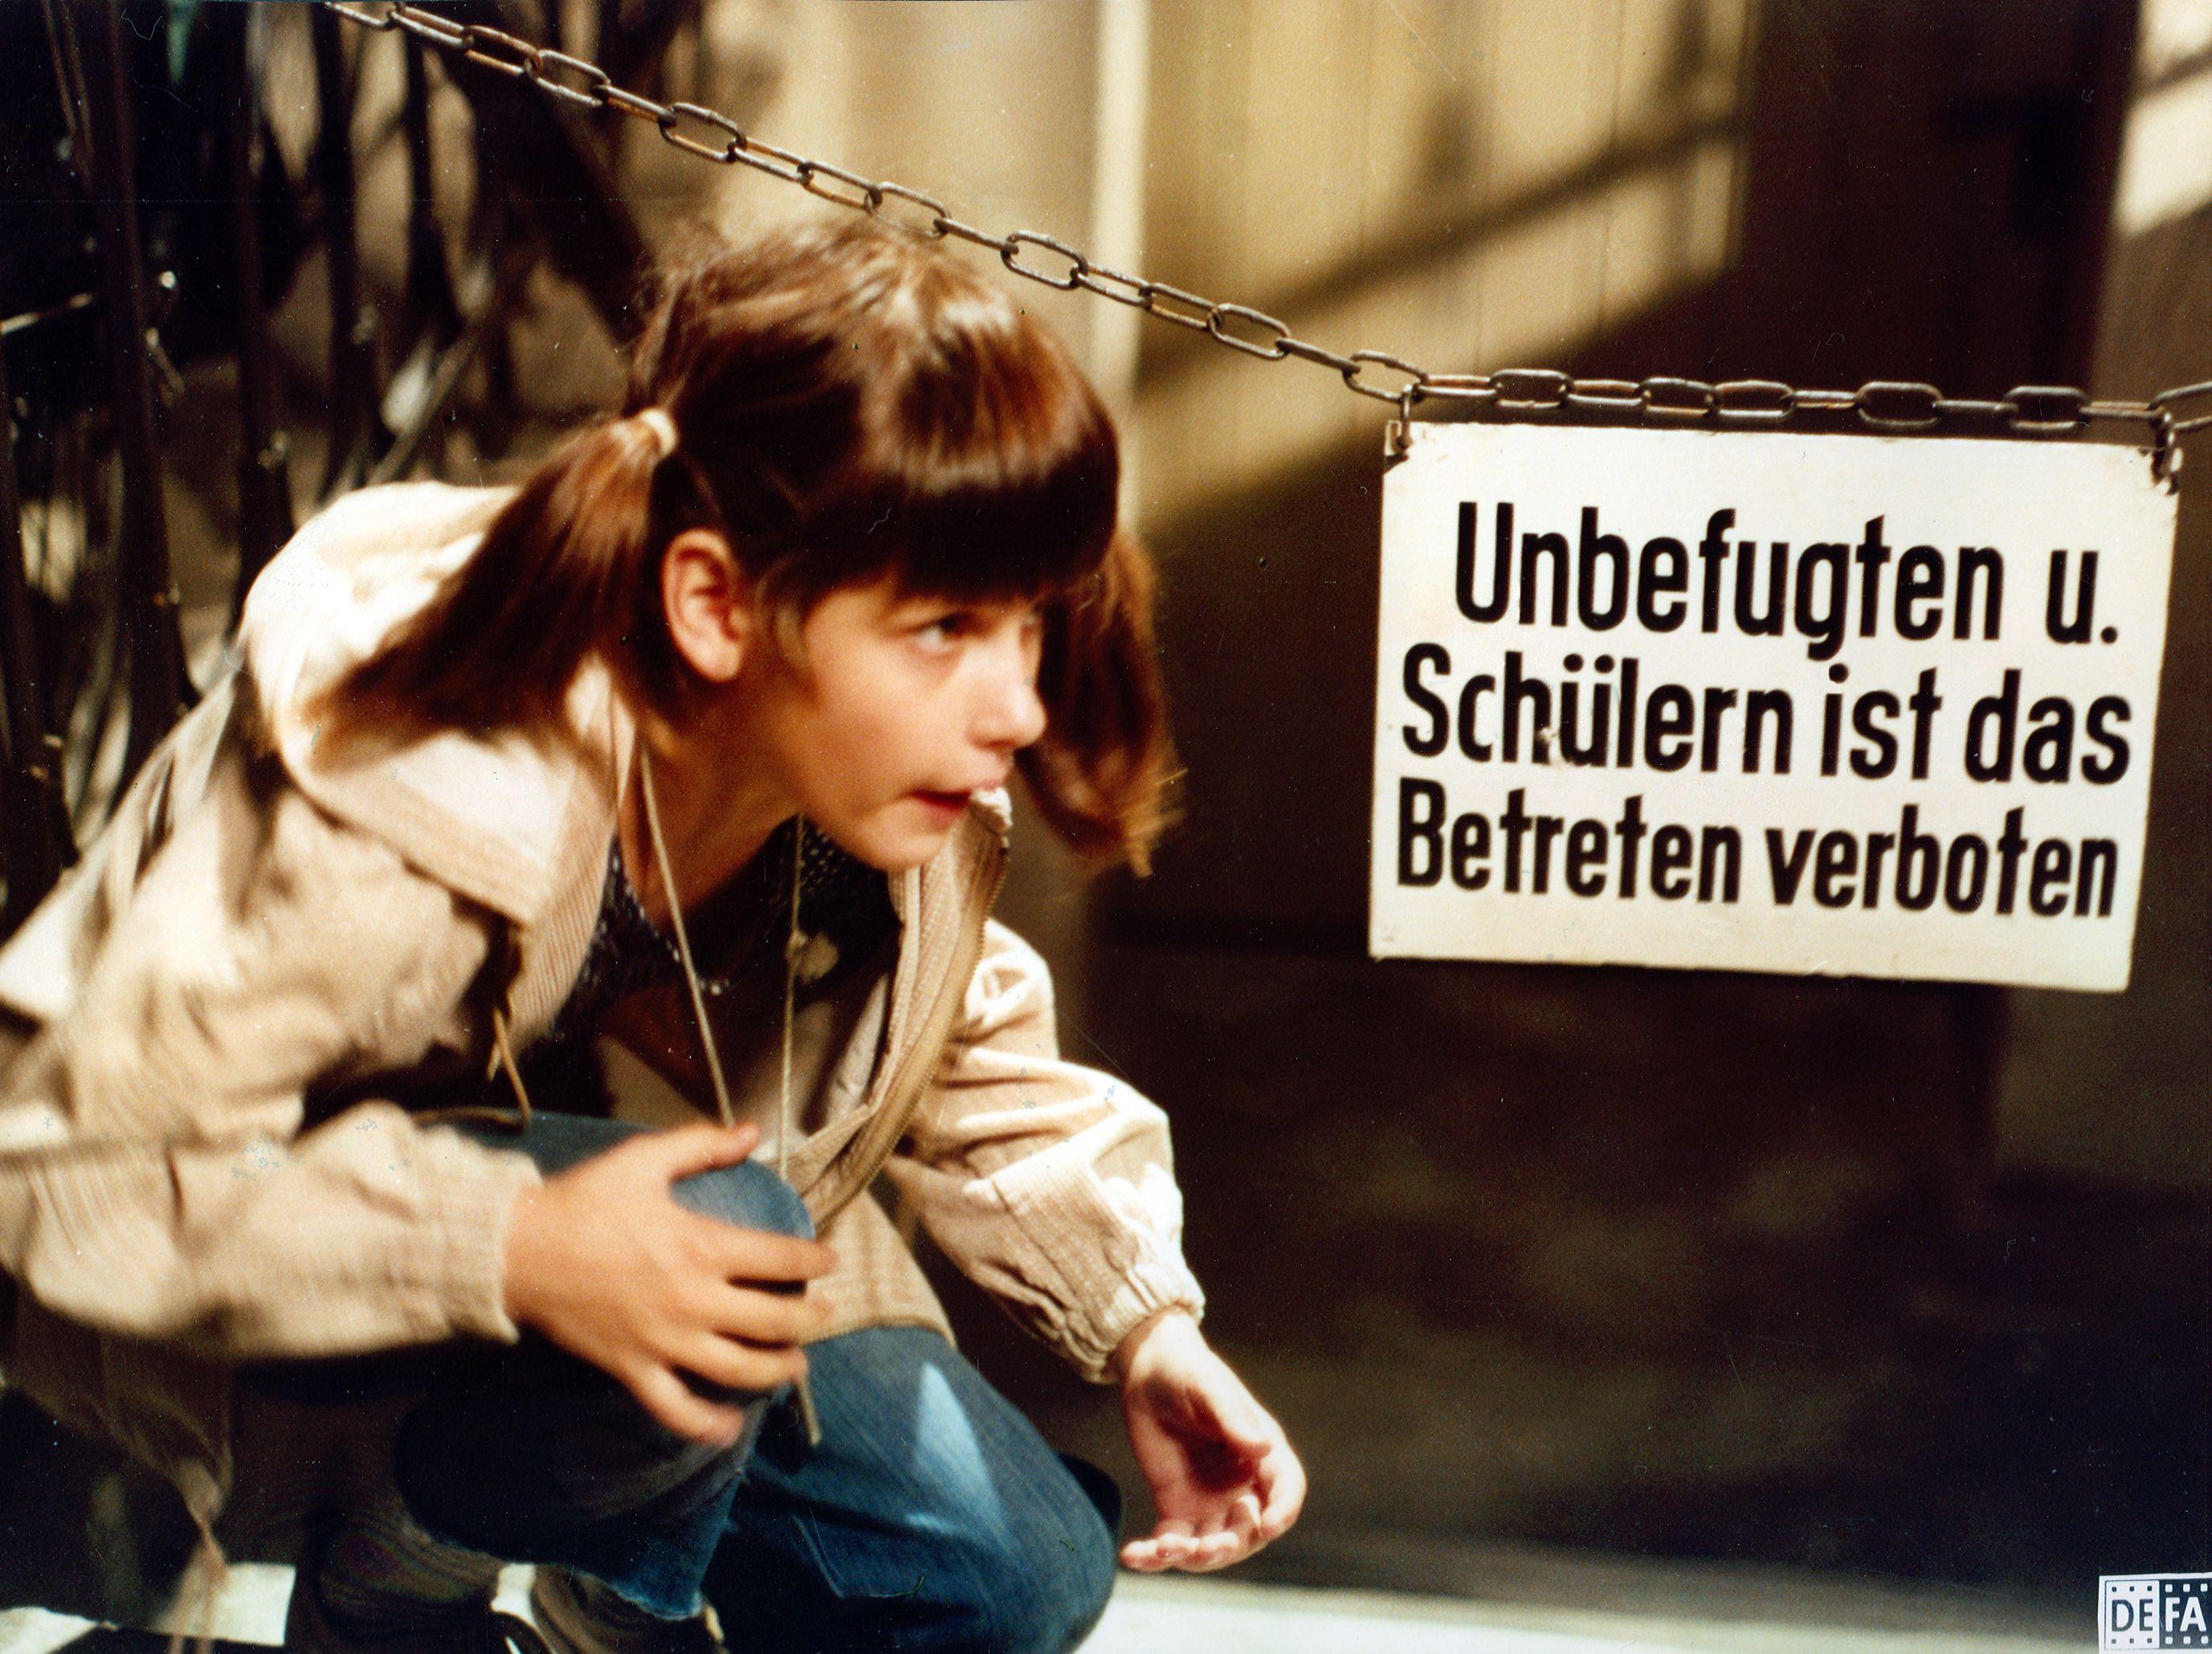 GESPEN_3_Copyright_DEFA_Stiftung_Siegfried_Skodula